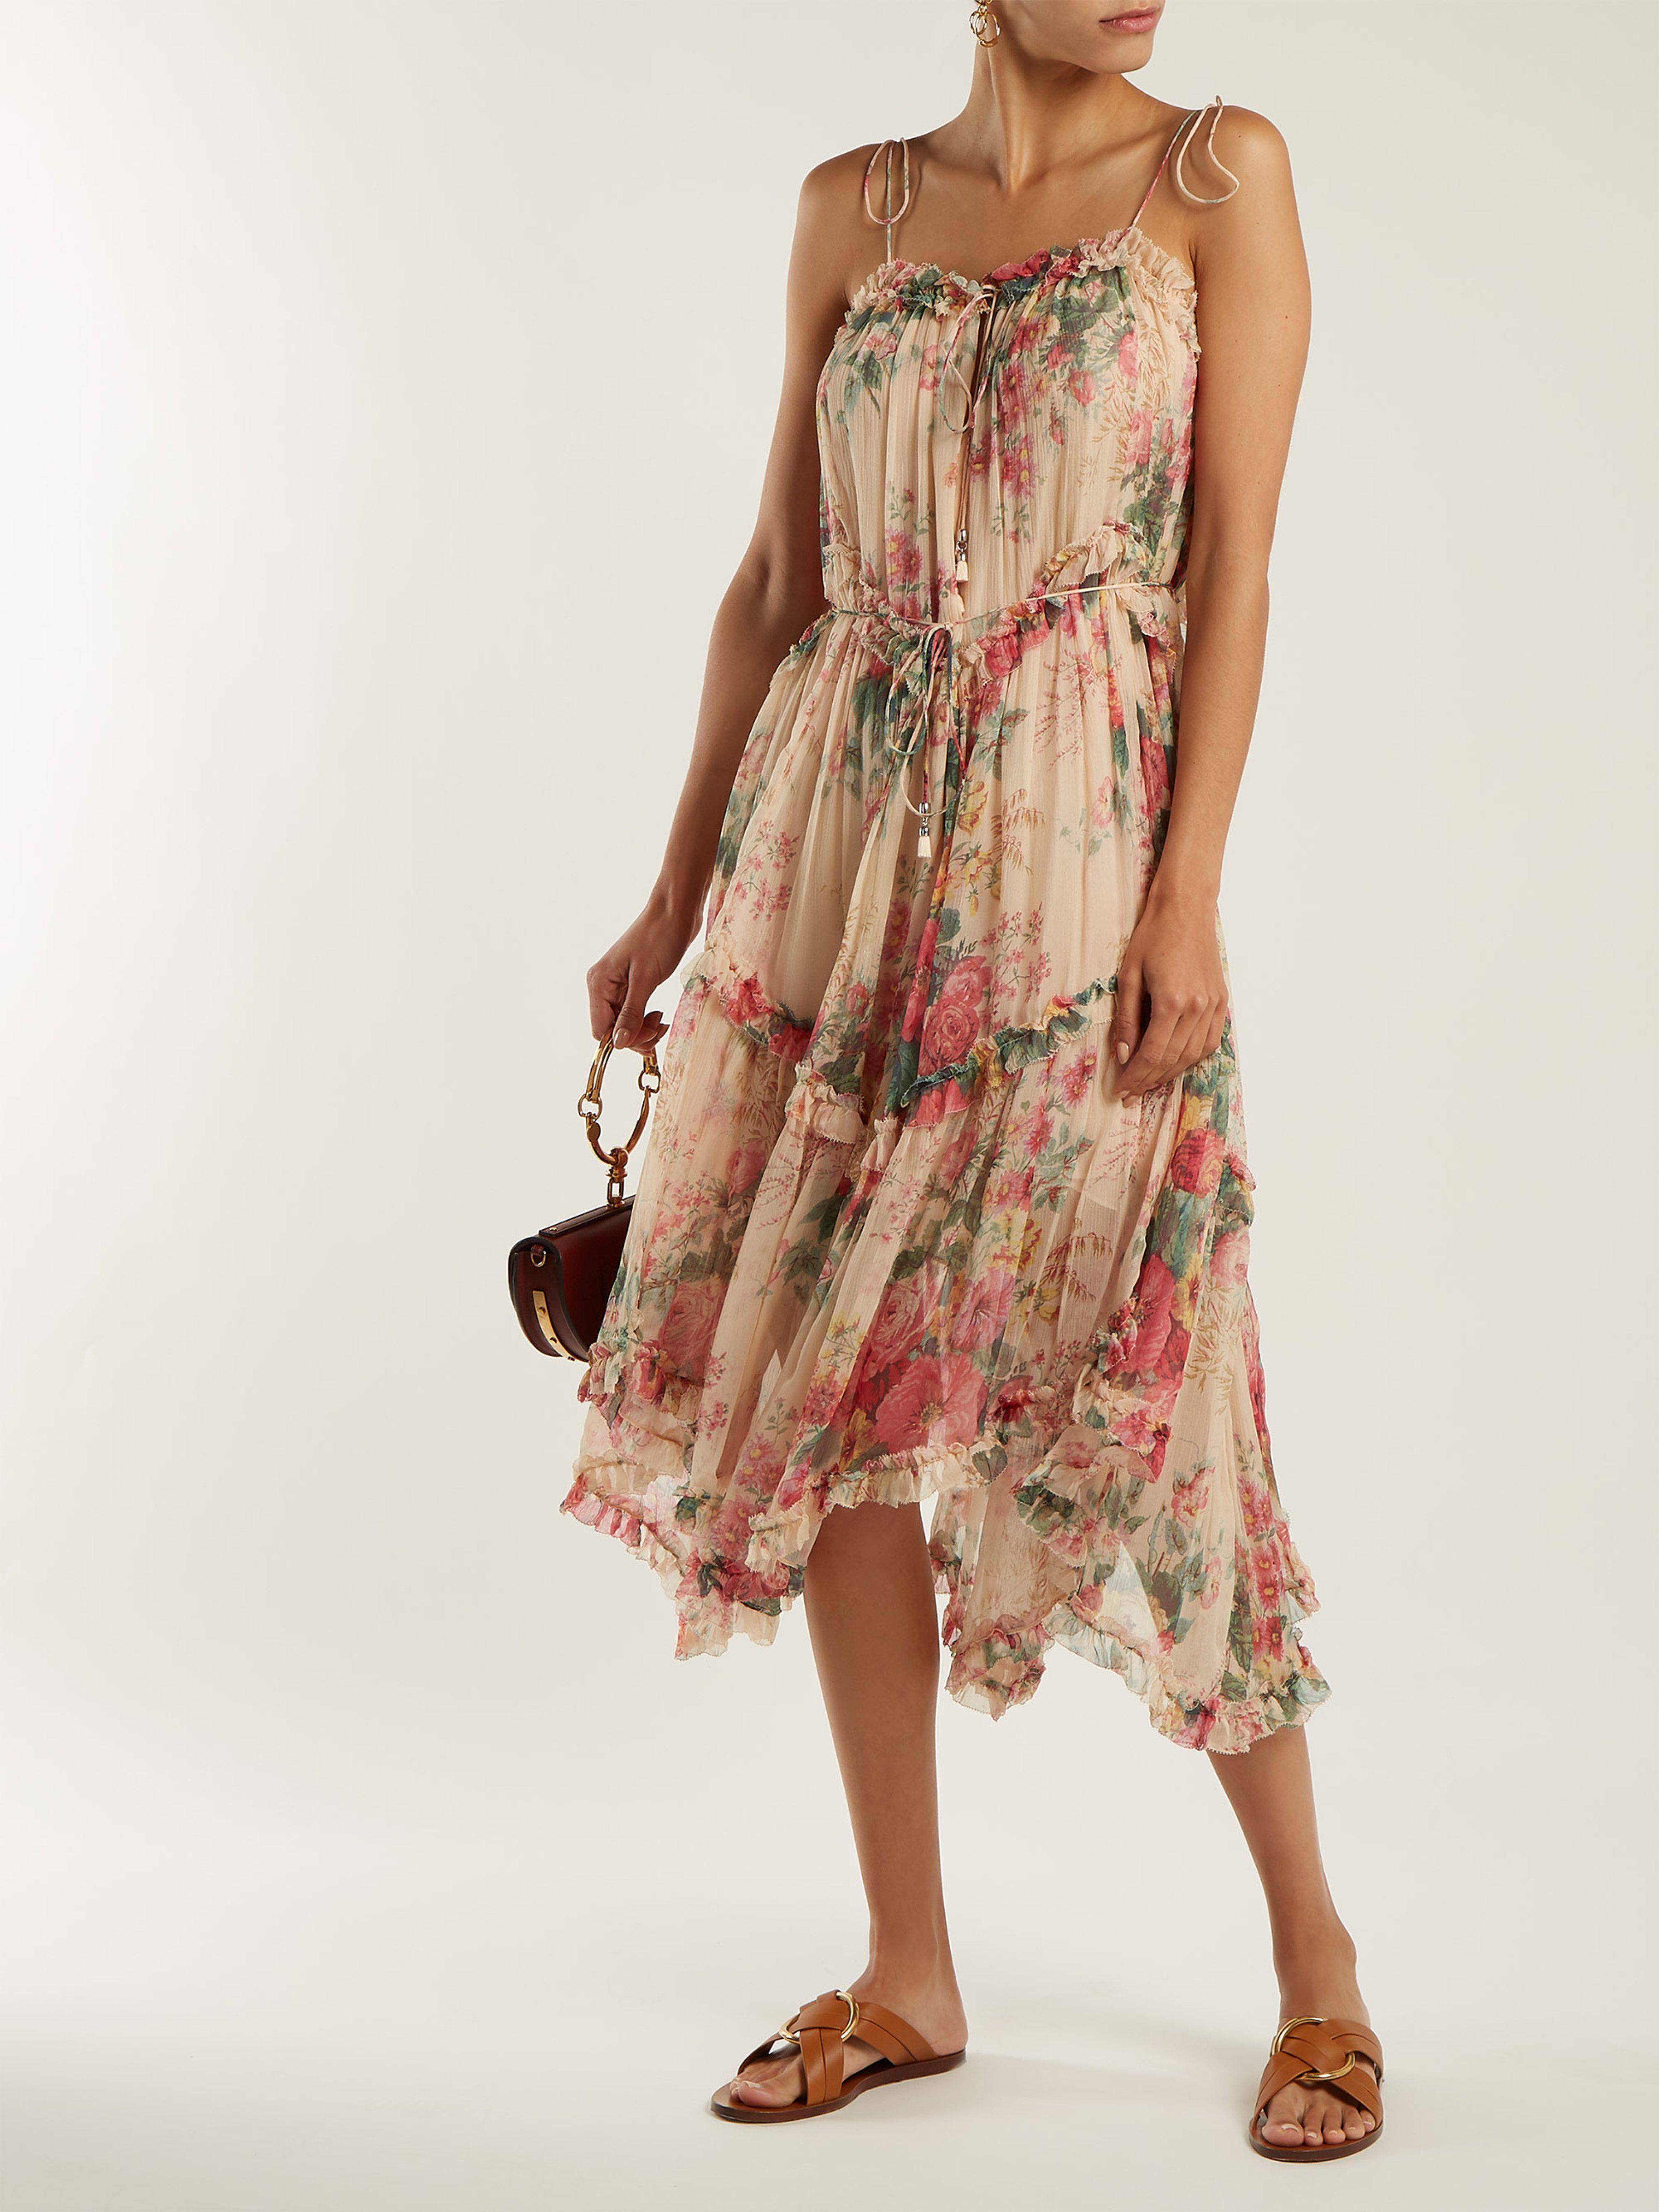 a728db39c9 Zimmermann - Multicolor Laelia Floral Print Silk Dress - Lyst. View  fullscreen